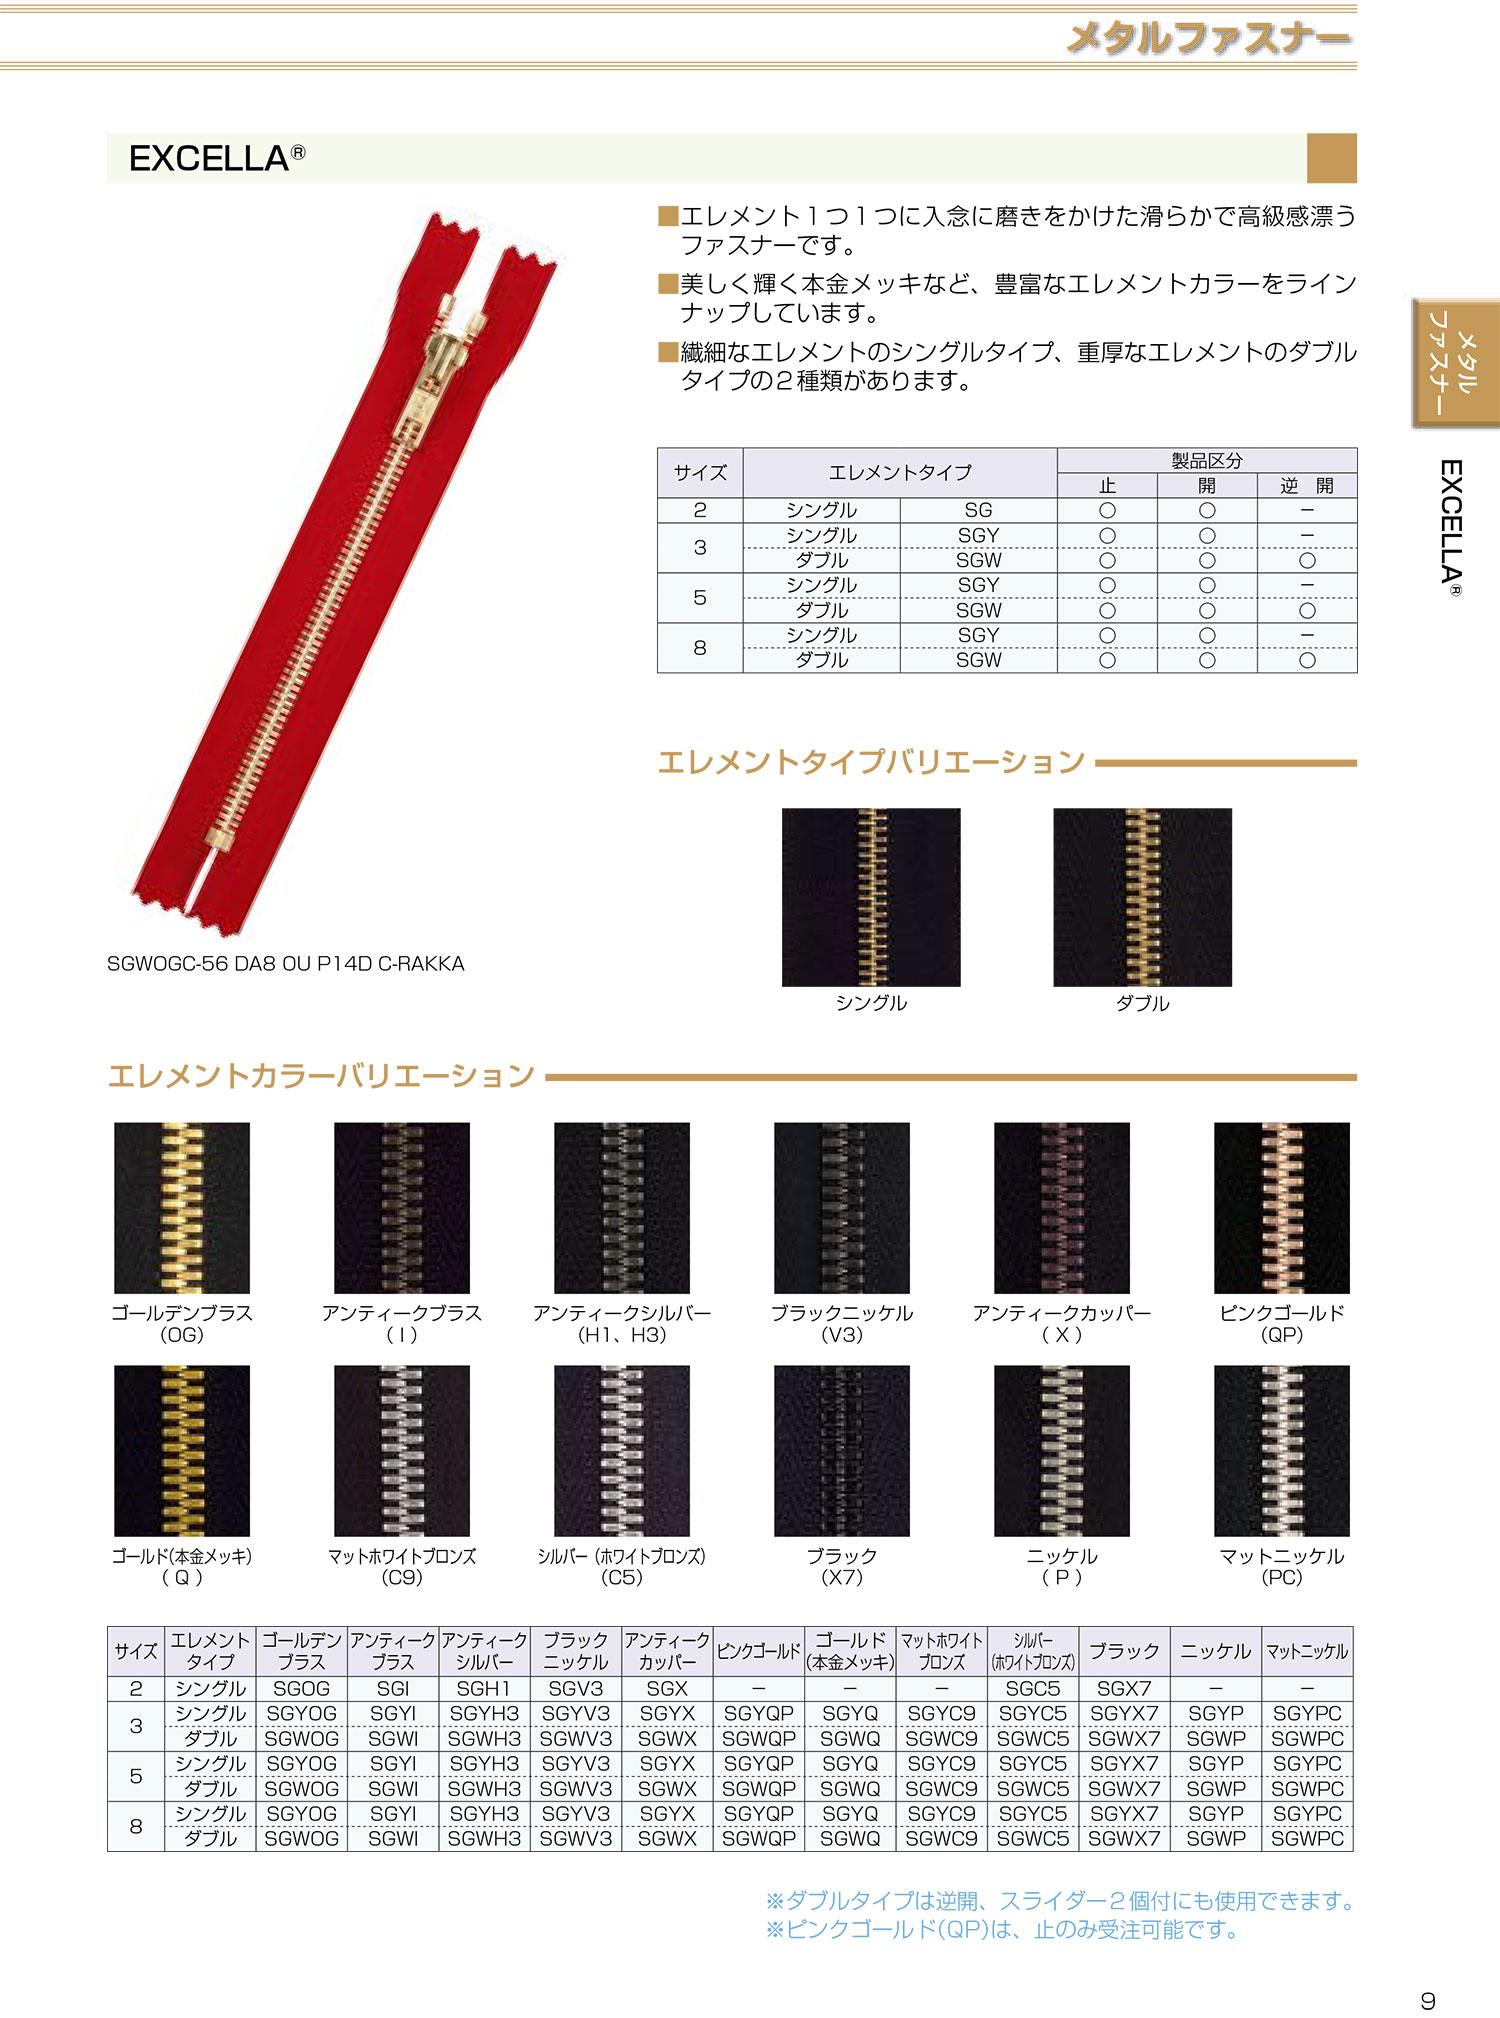 2SGIOR エクセラ 2サイズ アンティークブラス オープン シングル[ファスナー] YKK/オークラ商事 - ApparelX アパレル資材卸通販